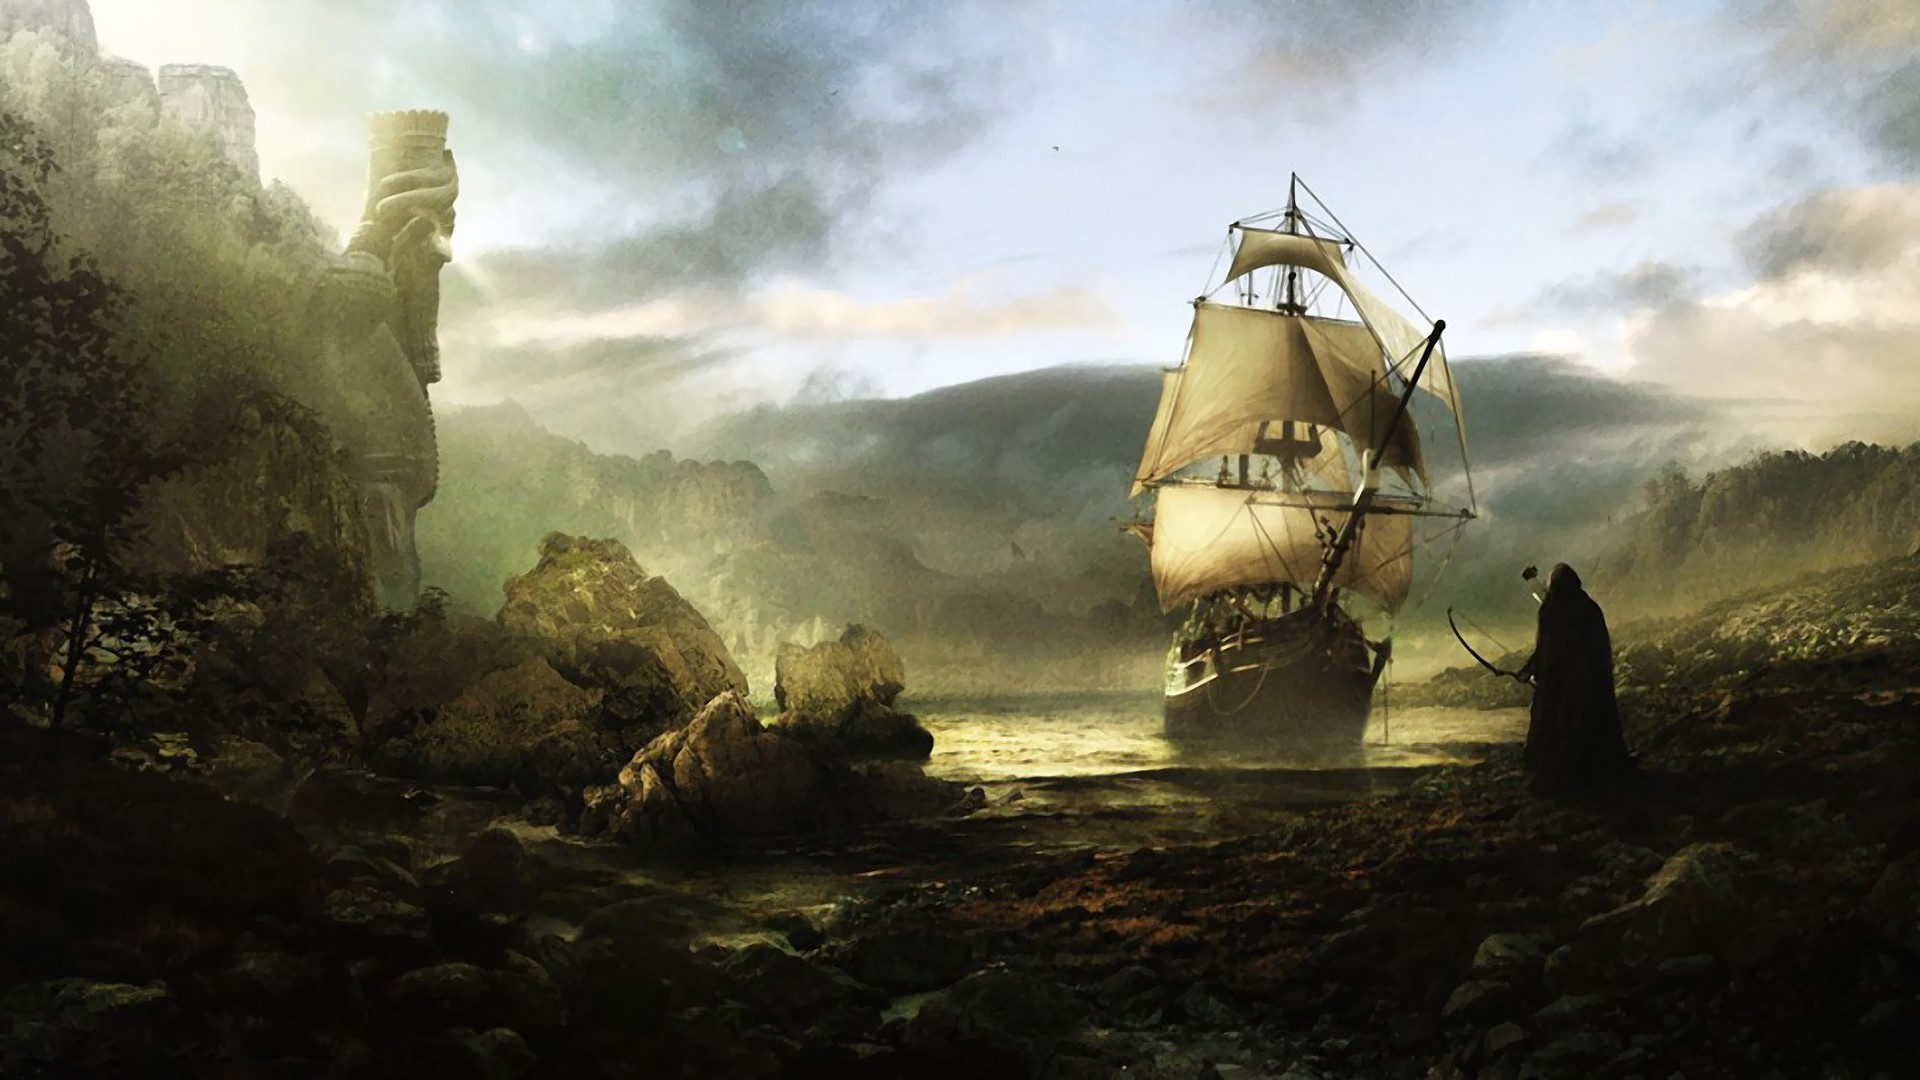 Art Abstract Old Ship Wallpaper HD #1633 Wallpaper | High Resolution .